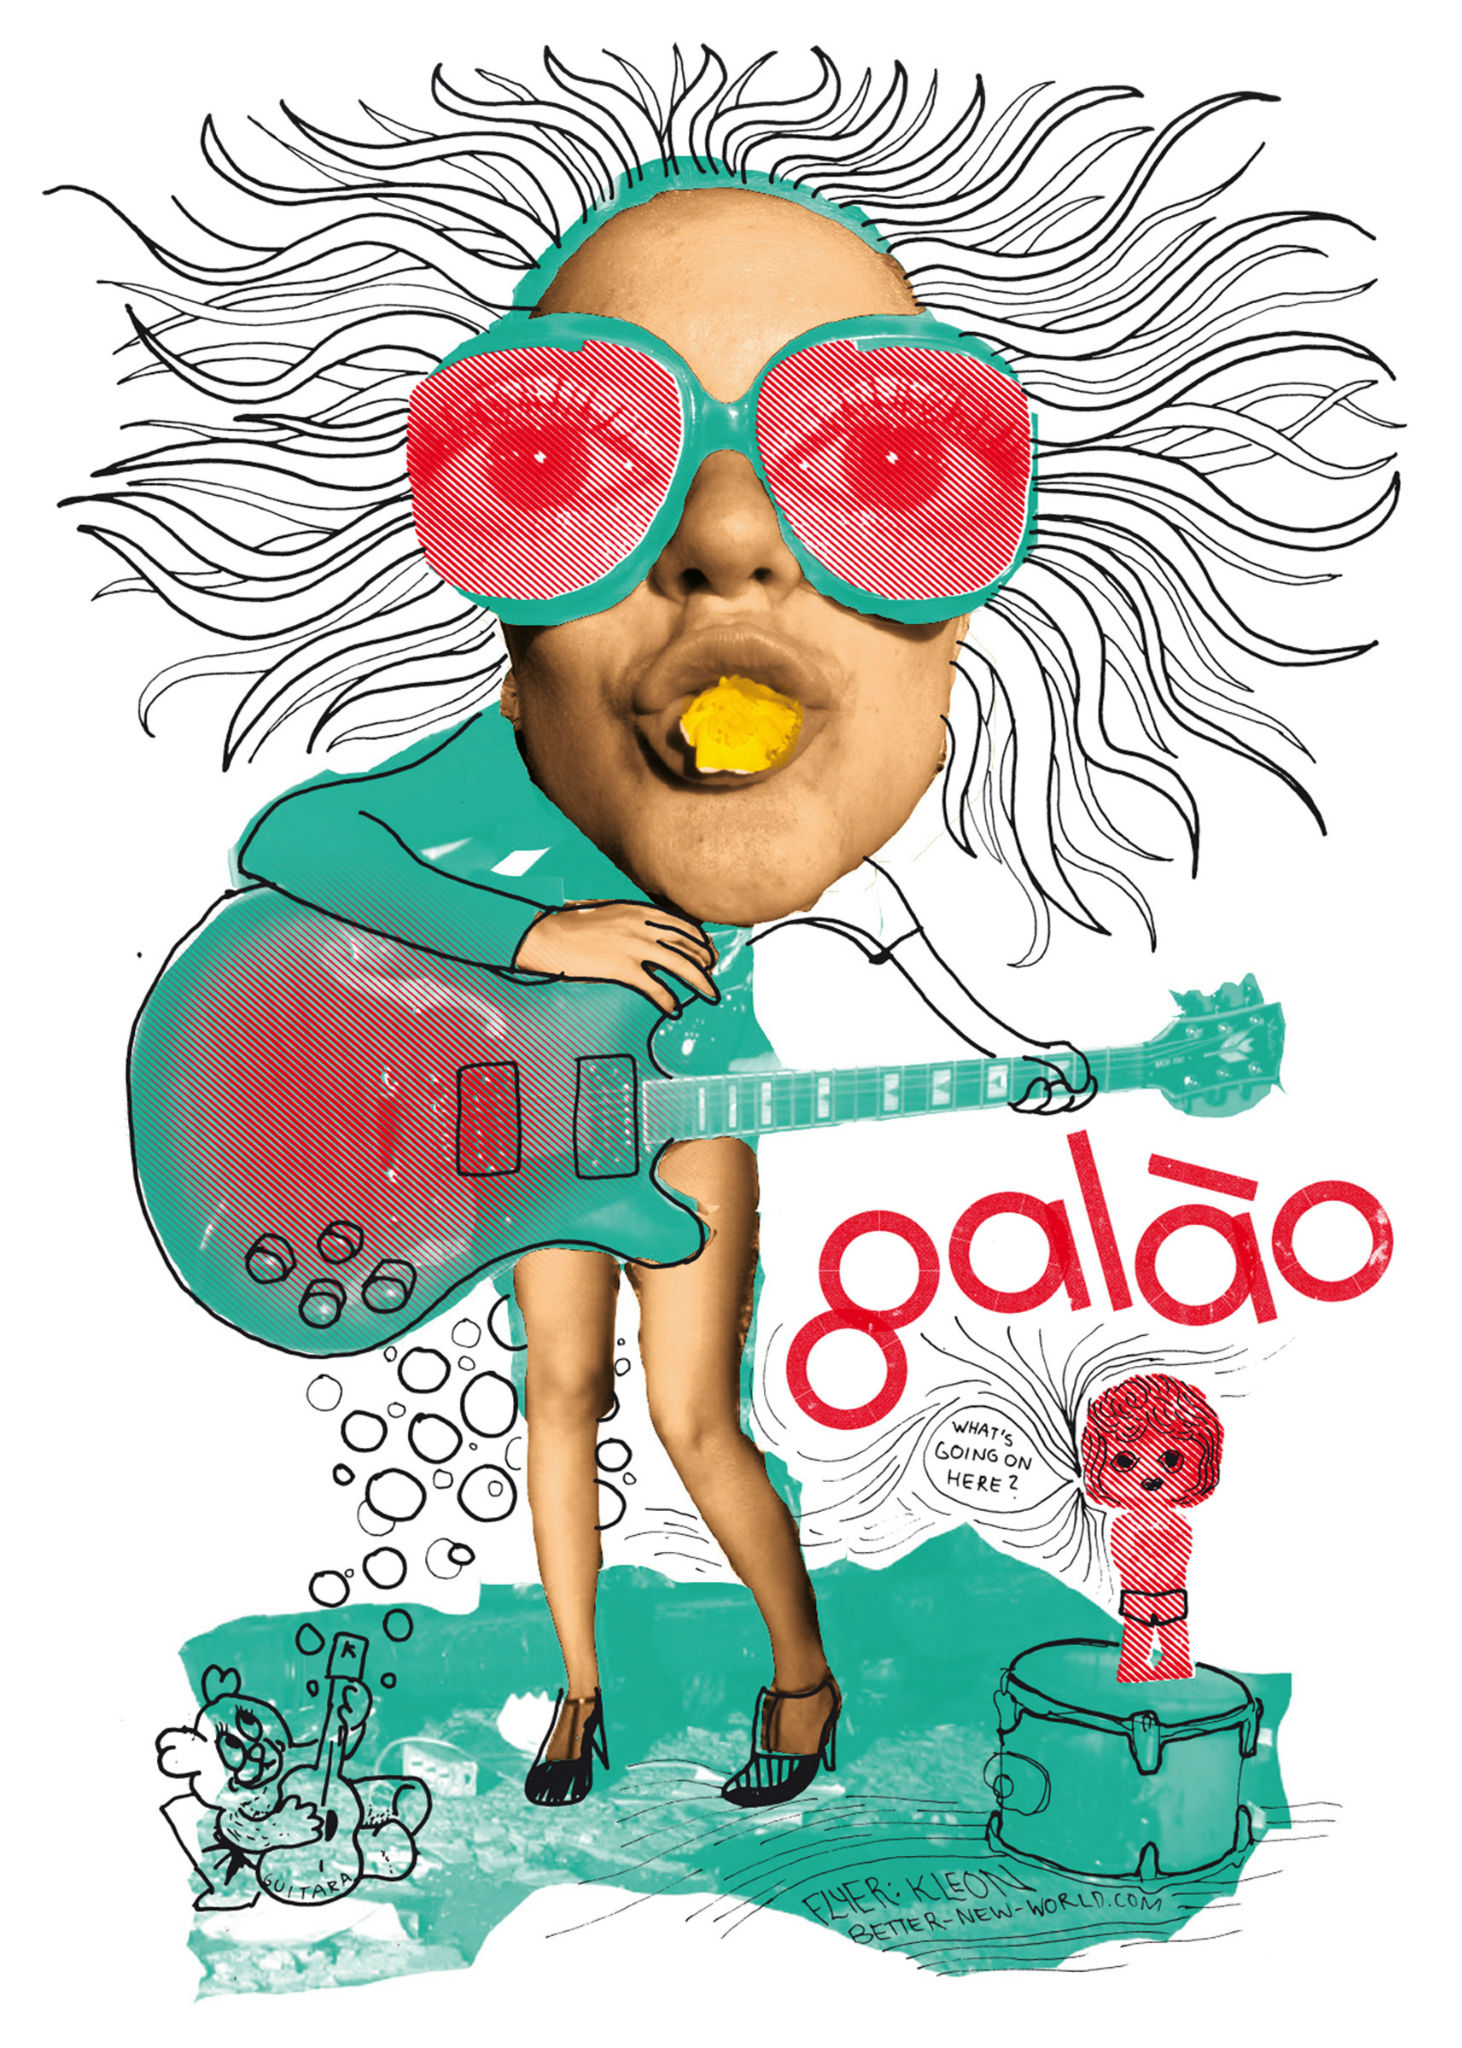 Kleon Medugorac Café Galao Flyer